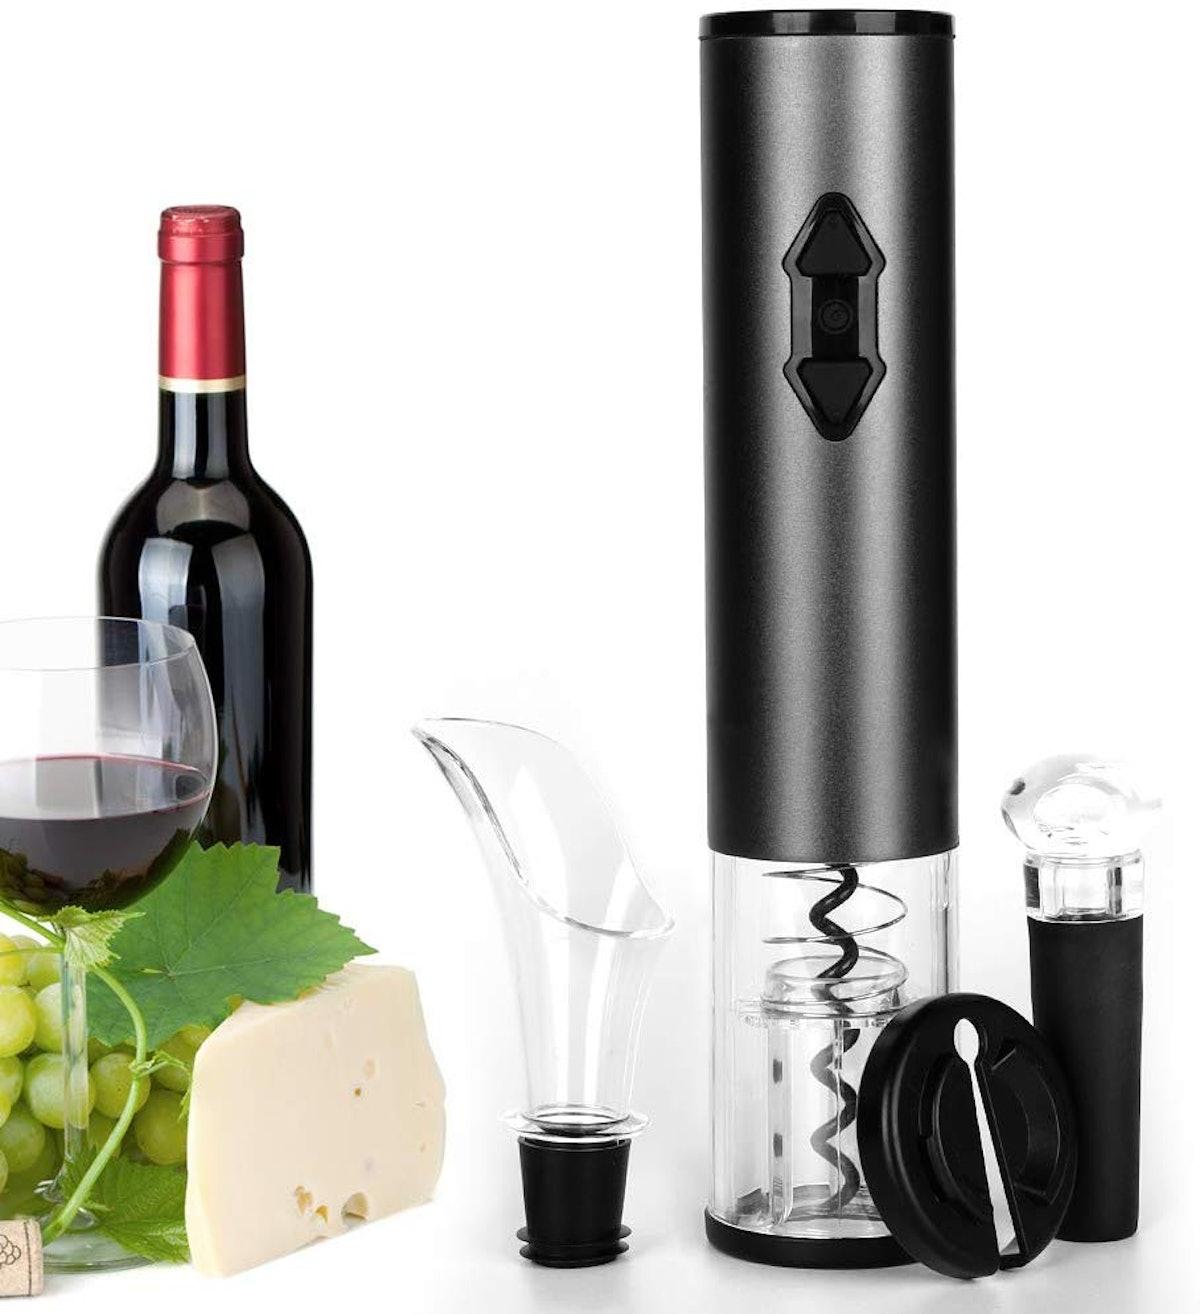 DEKINMAX Automatic Bottle Opener